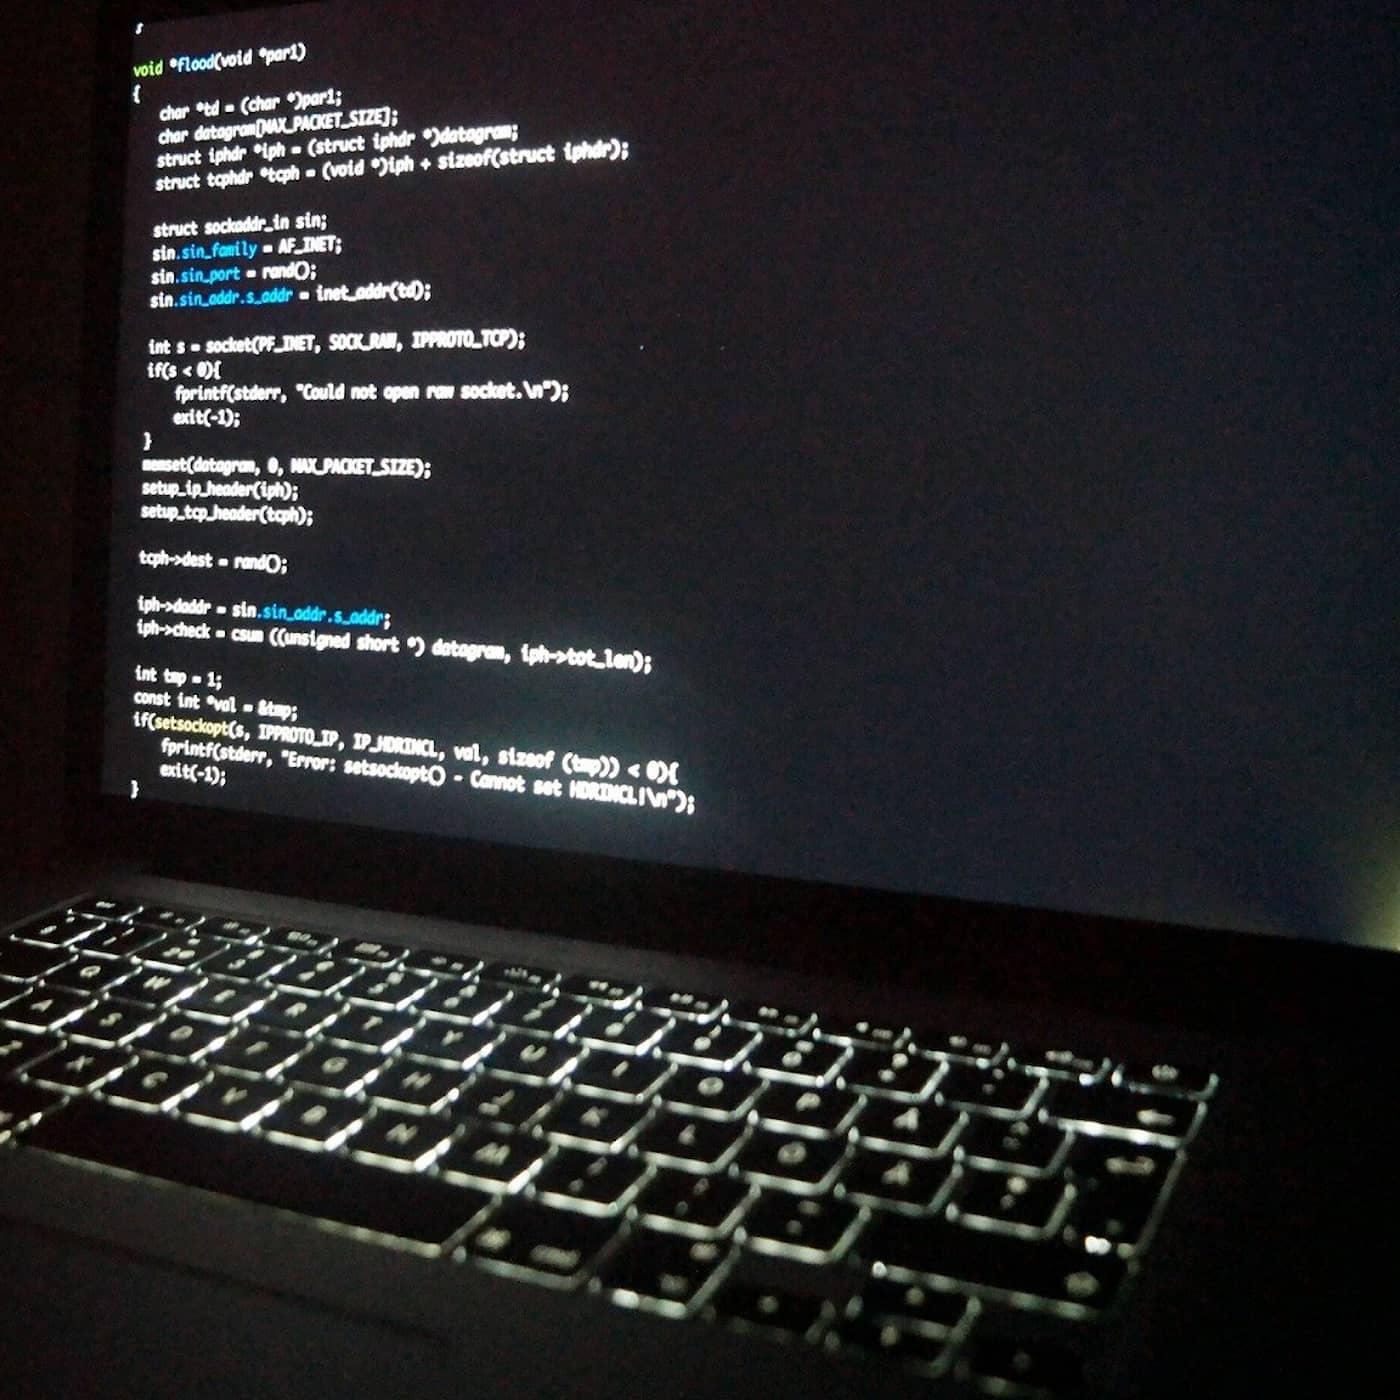 Om cyberkriget kommer